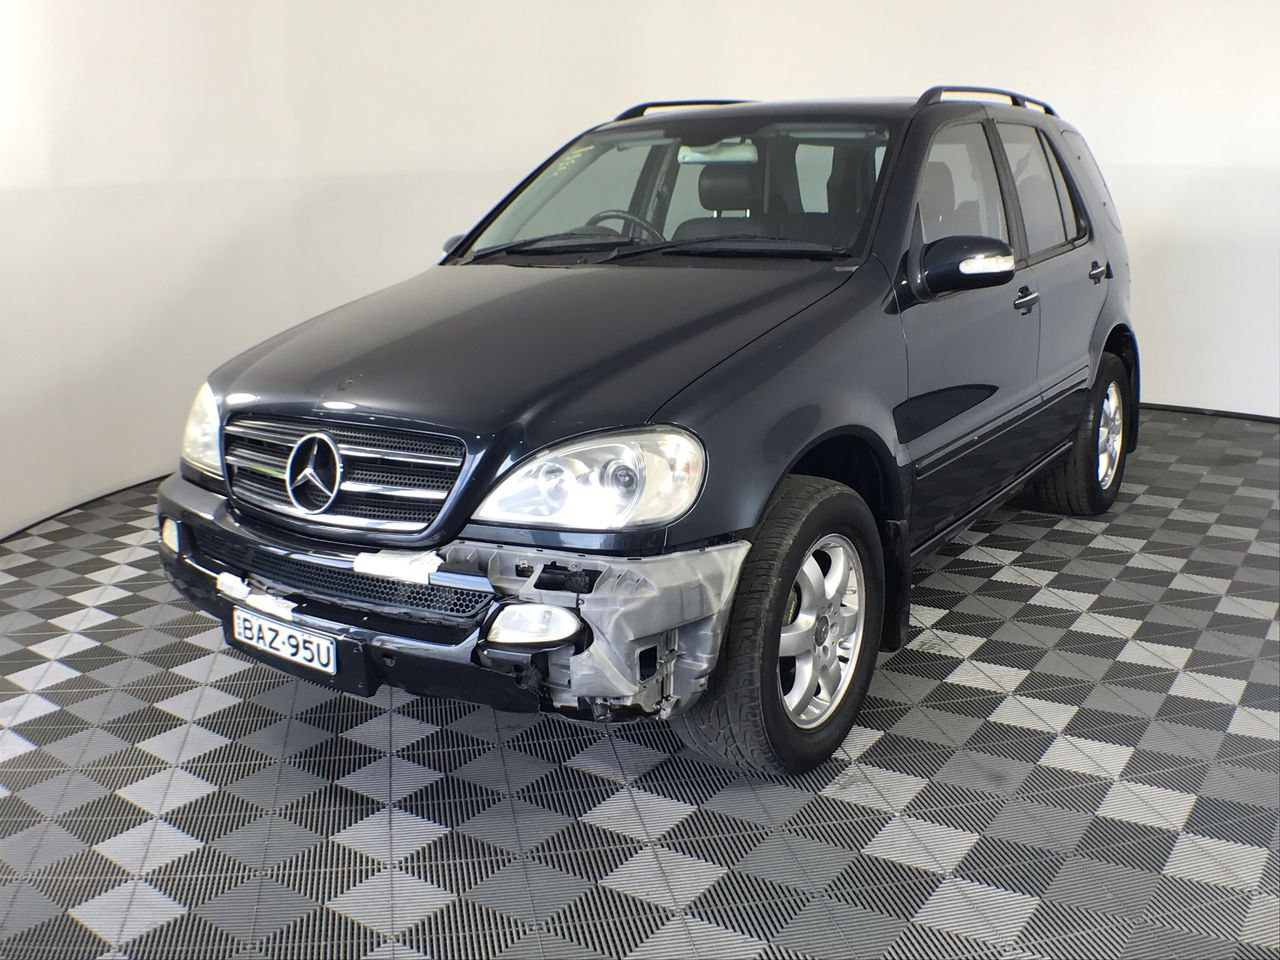 2003 Mercedes Benz ML 500 Luxury (4x4) W163 Automatic 7 Seats Wagon